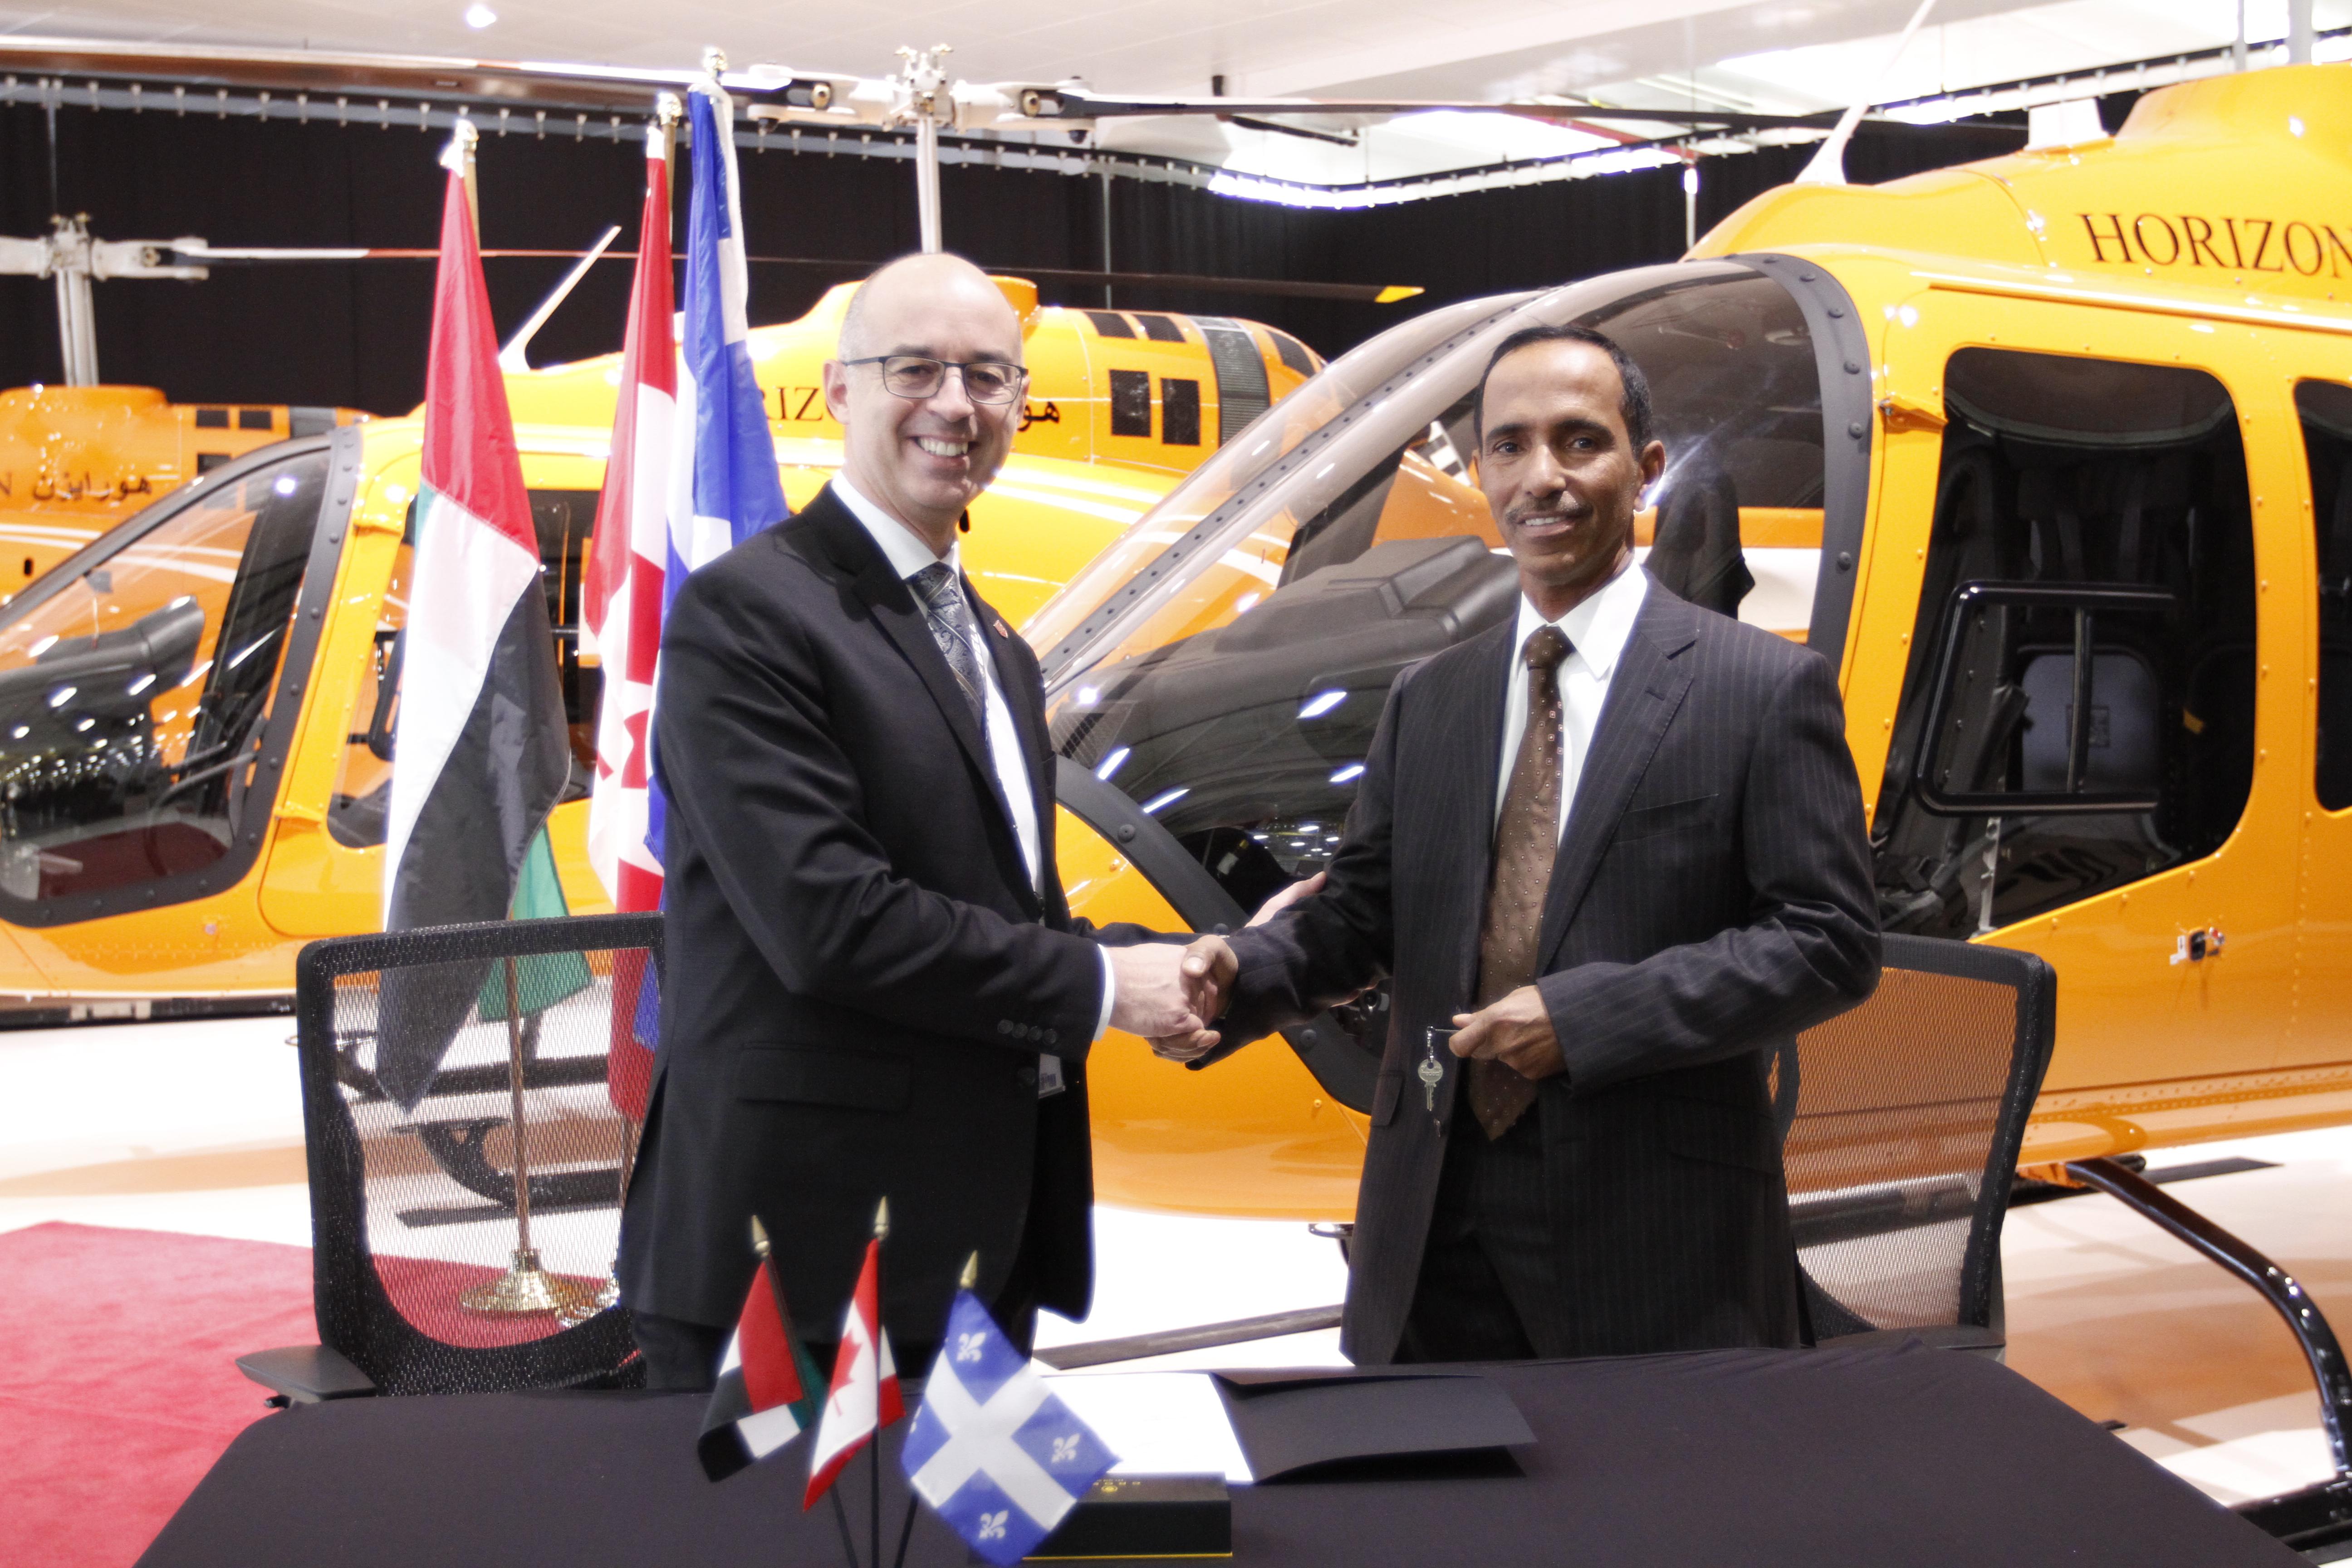 Horizon International Flight Academy logs more than 1,000 flight hours